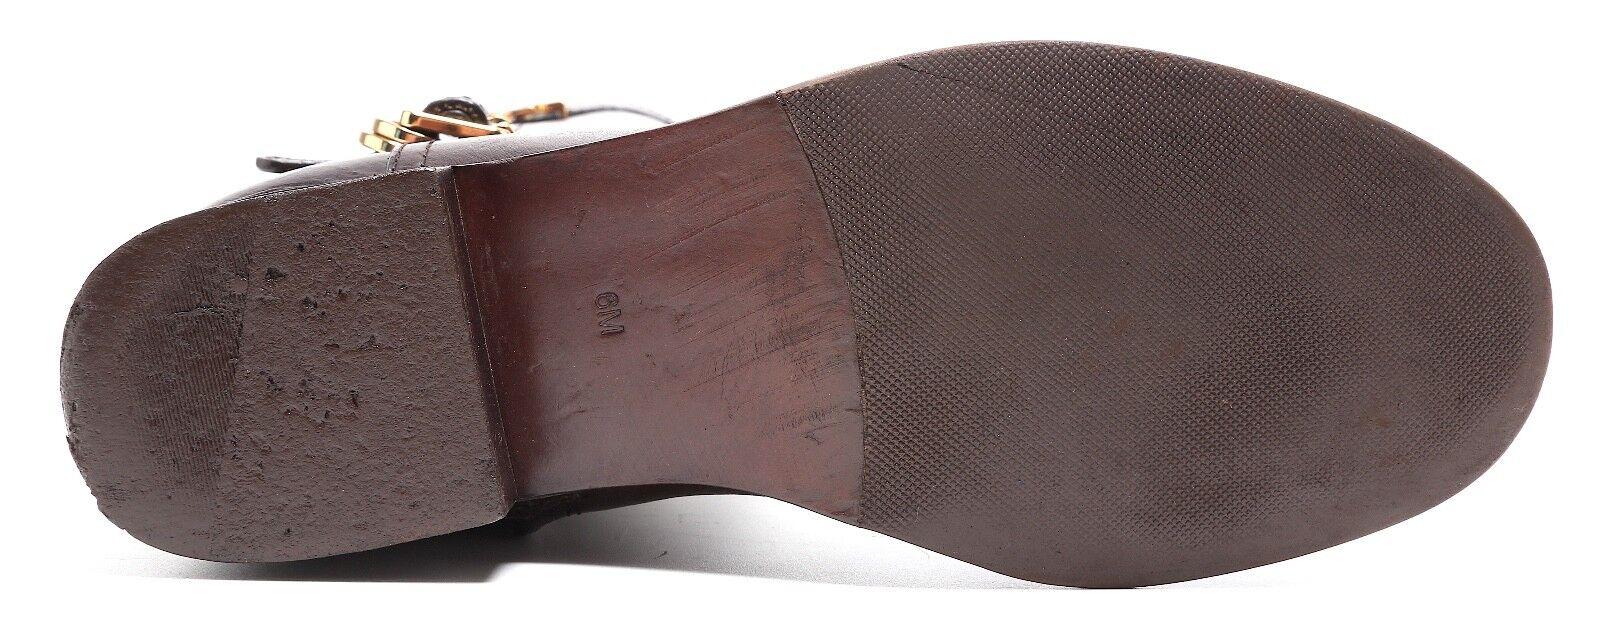 Tory Burch Eloise Leather Riding Boots Dark Brown Women Sz Sz Sz 6M 1081 38f3c0